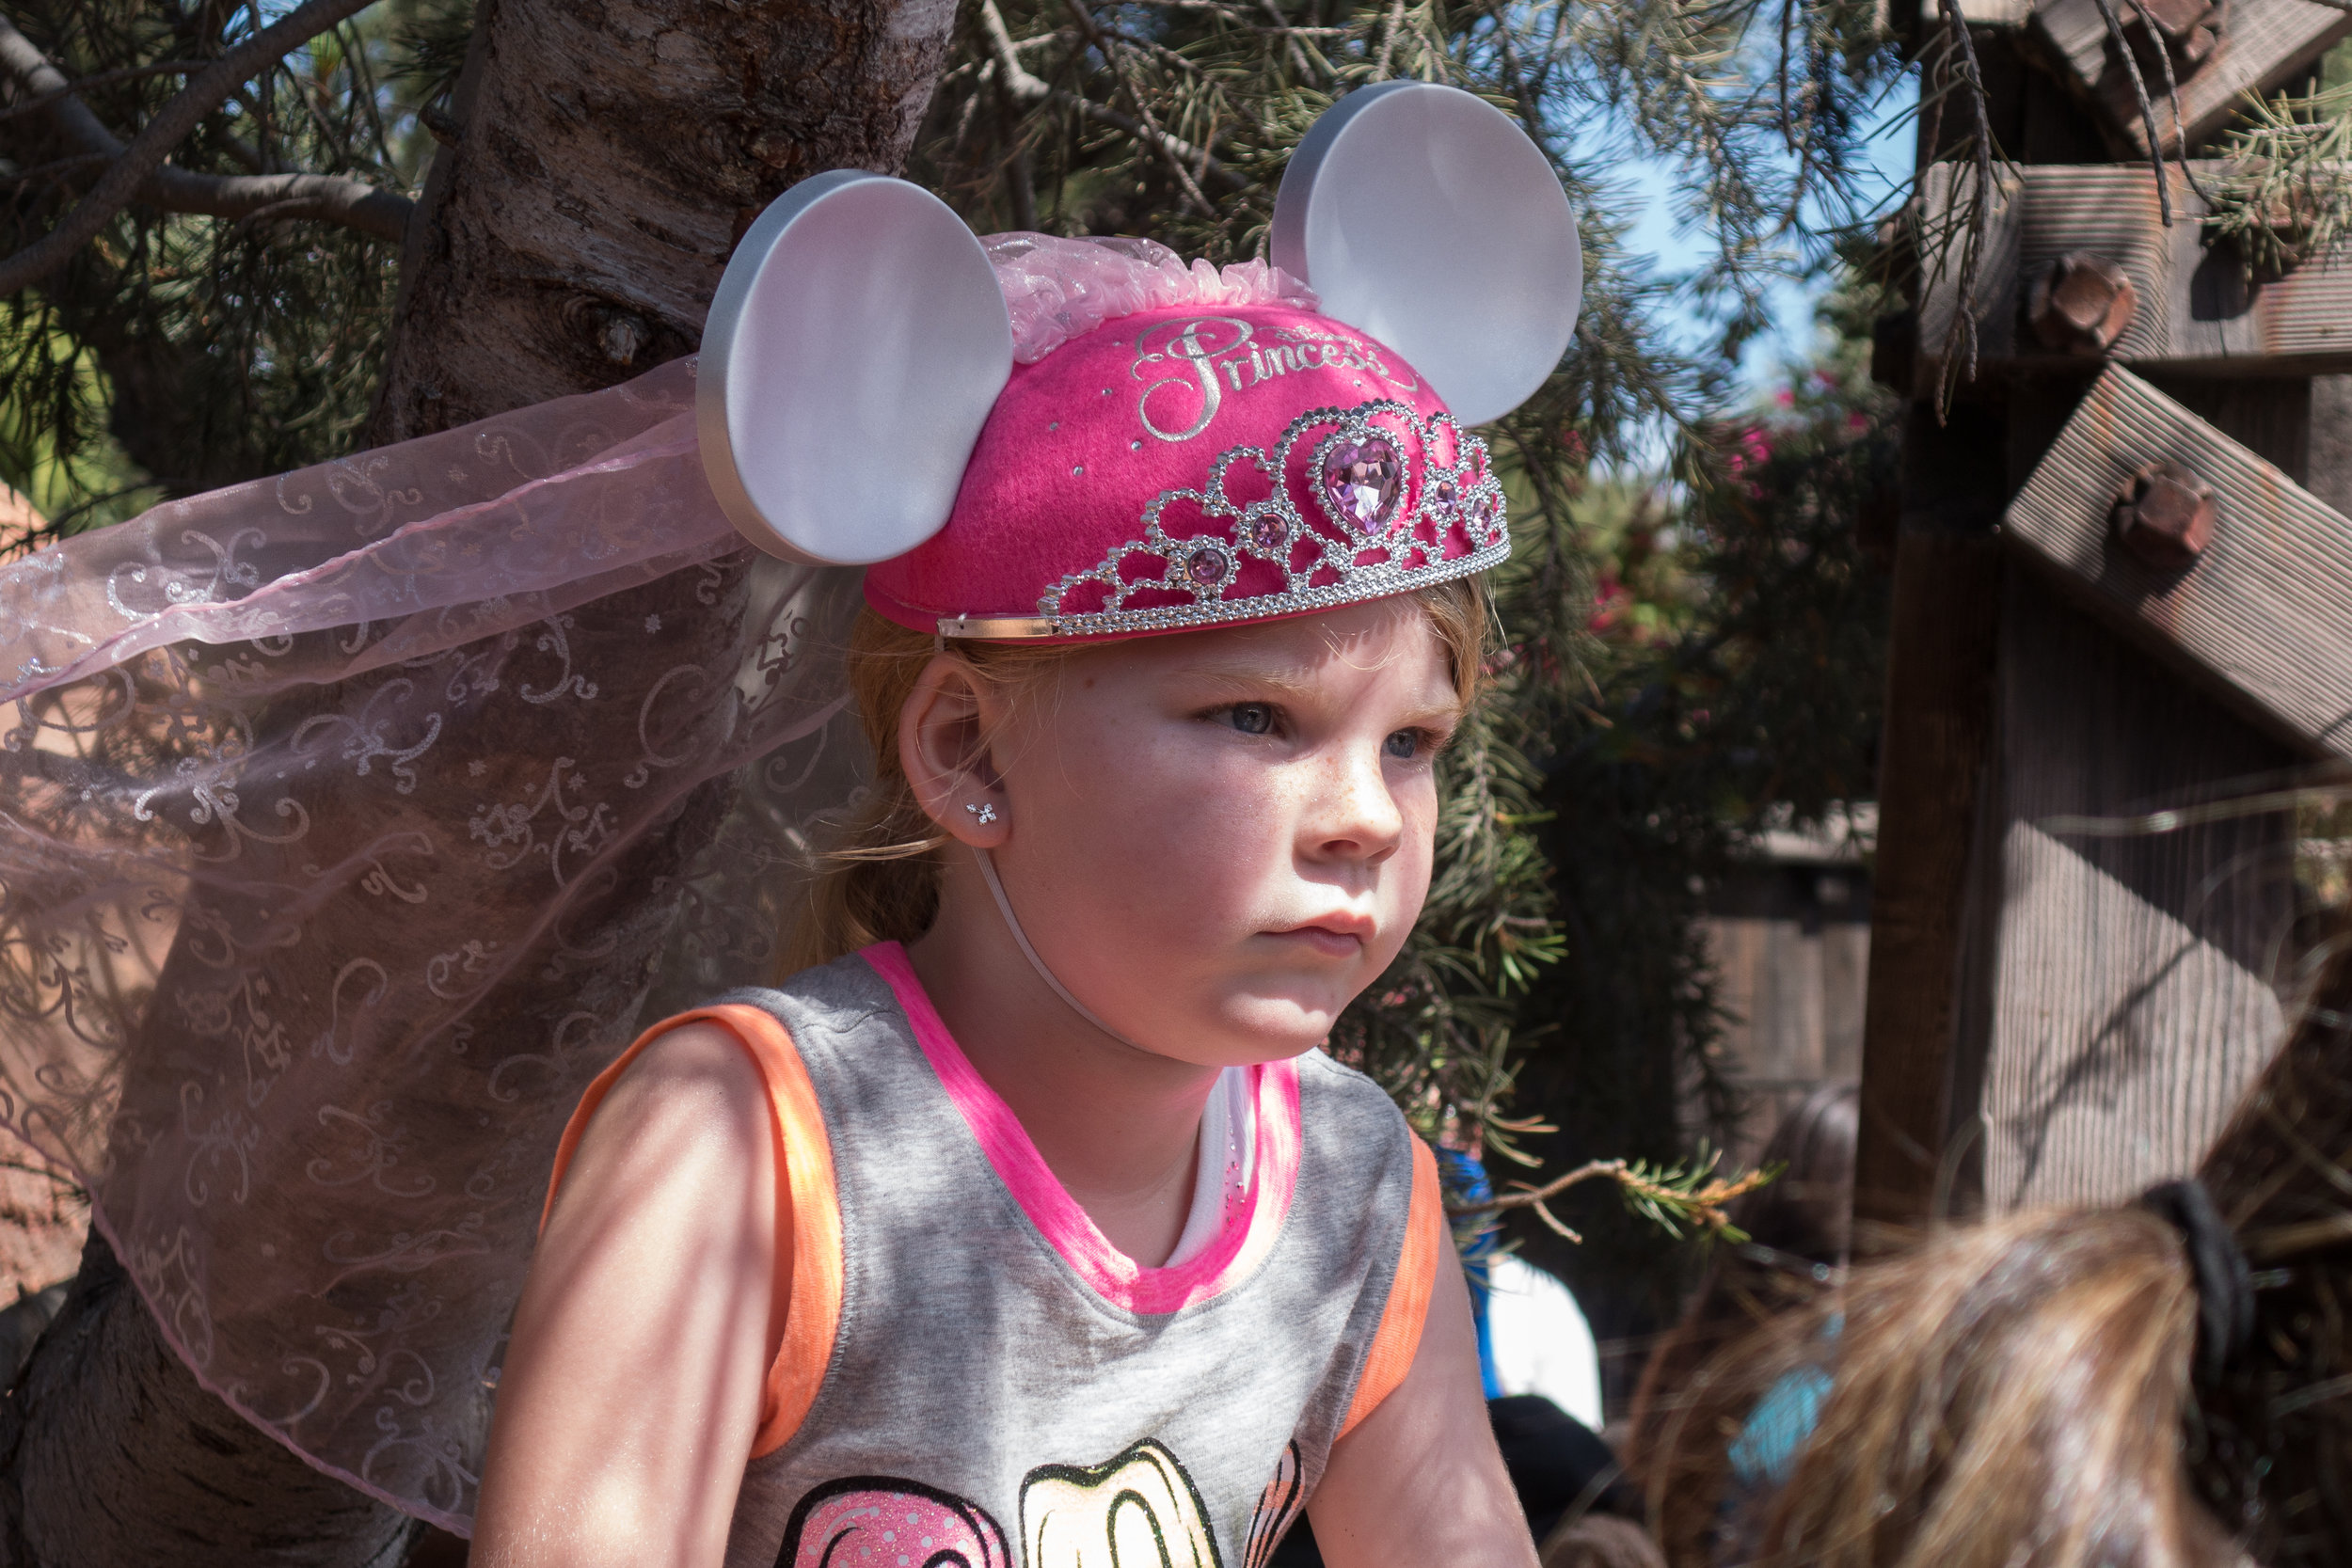 Disney-princess-hat-4-02091.jpg